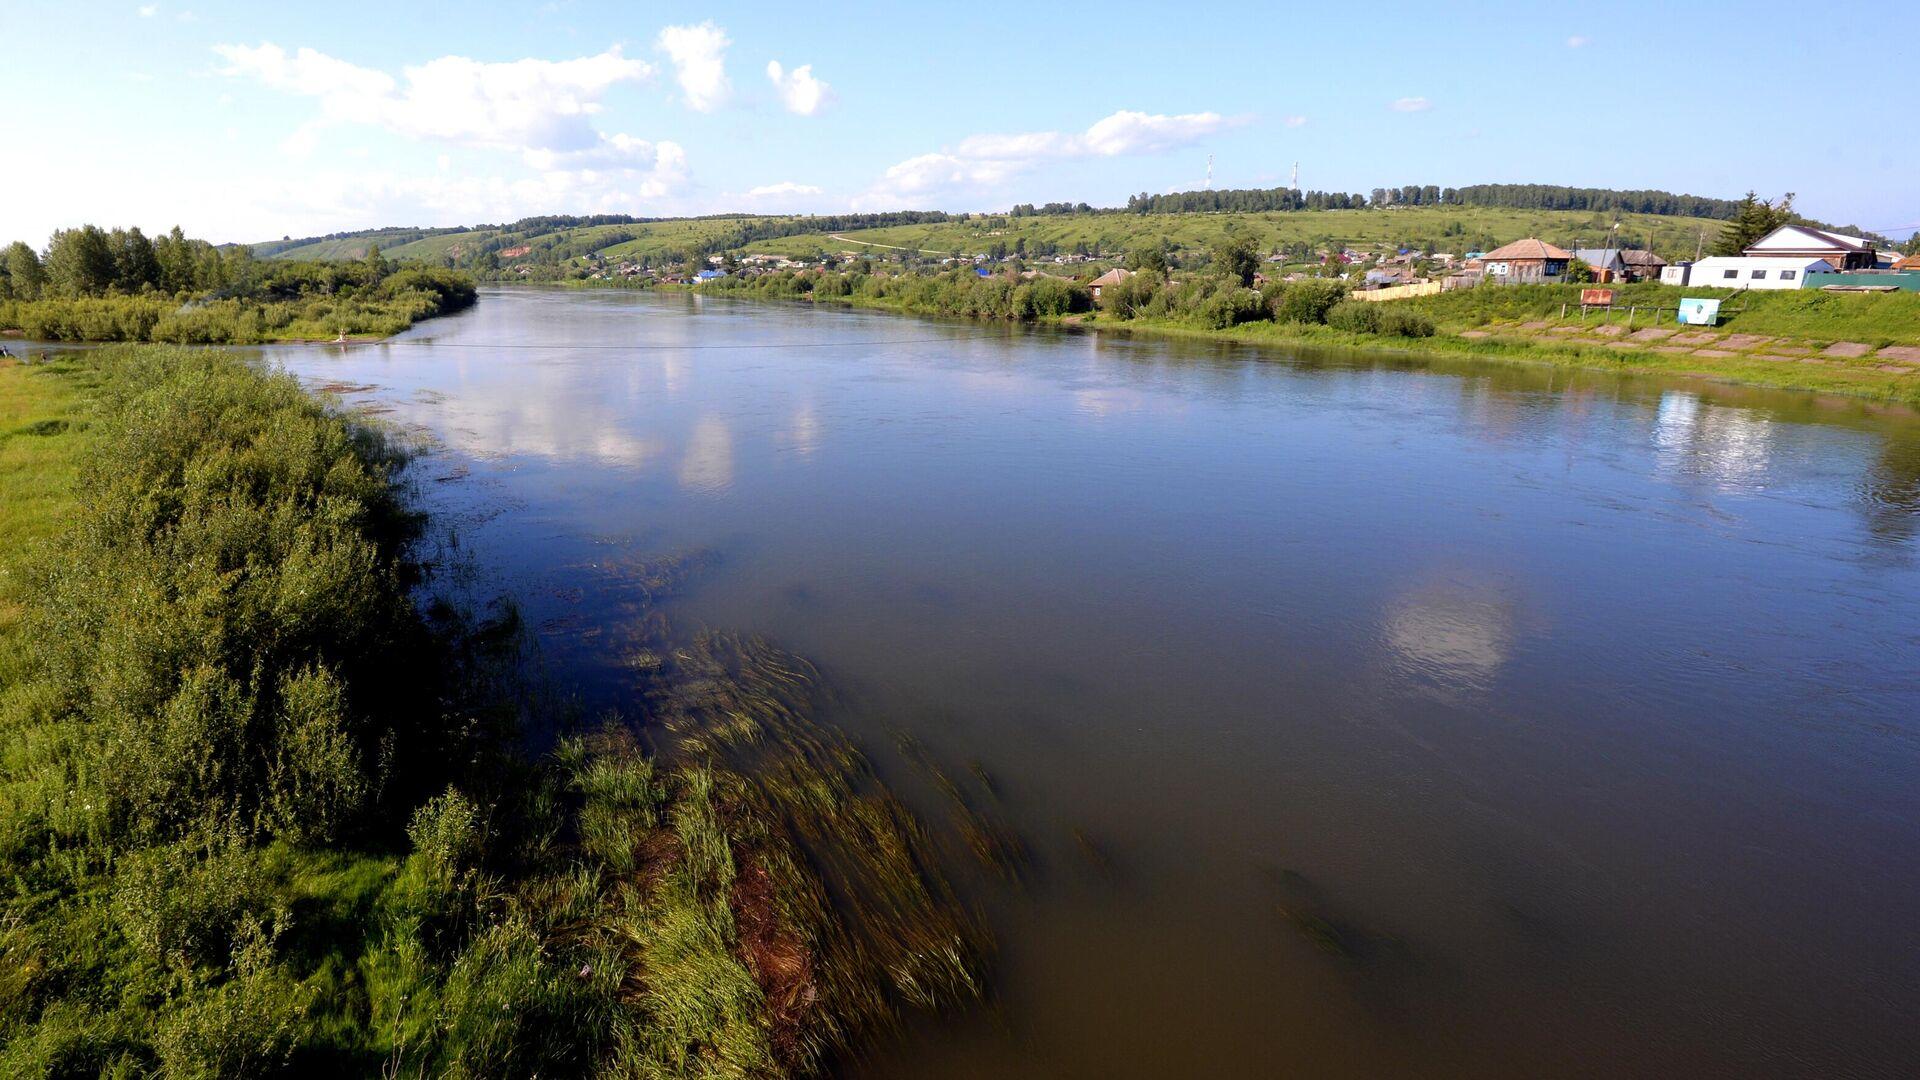 1577862202 0:0:3120:1756 1920x0 80 0 0 72216d8b699848d0854b57e39942c598 - Найдено объяснение странным пятнам на реке Чулым в Красноярском крае